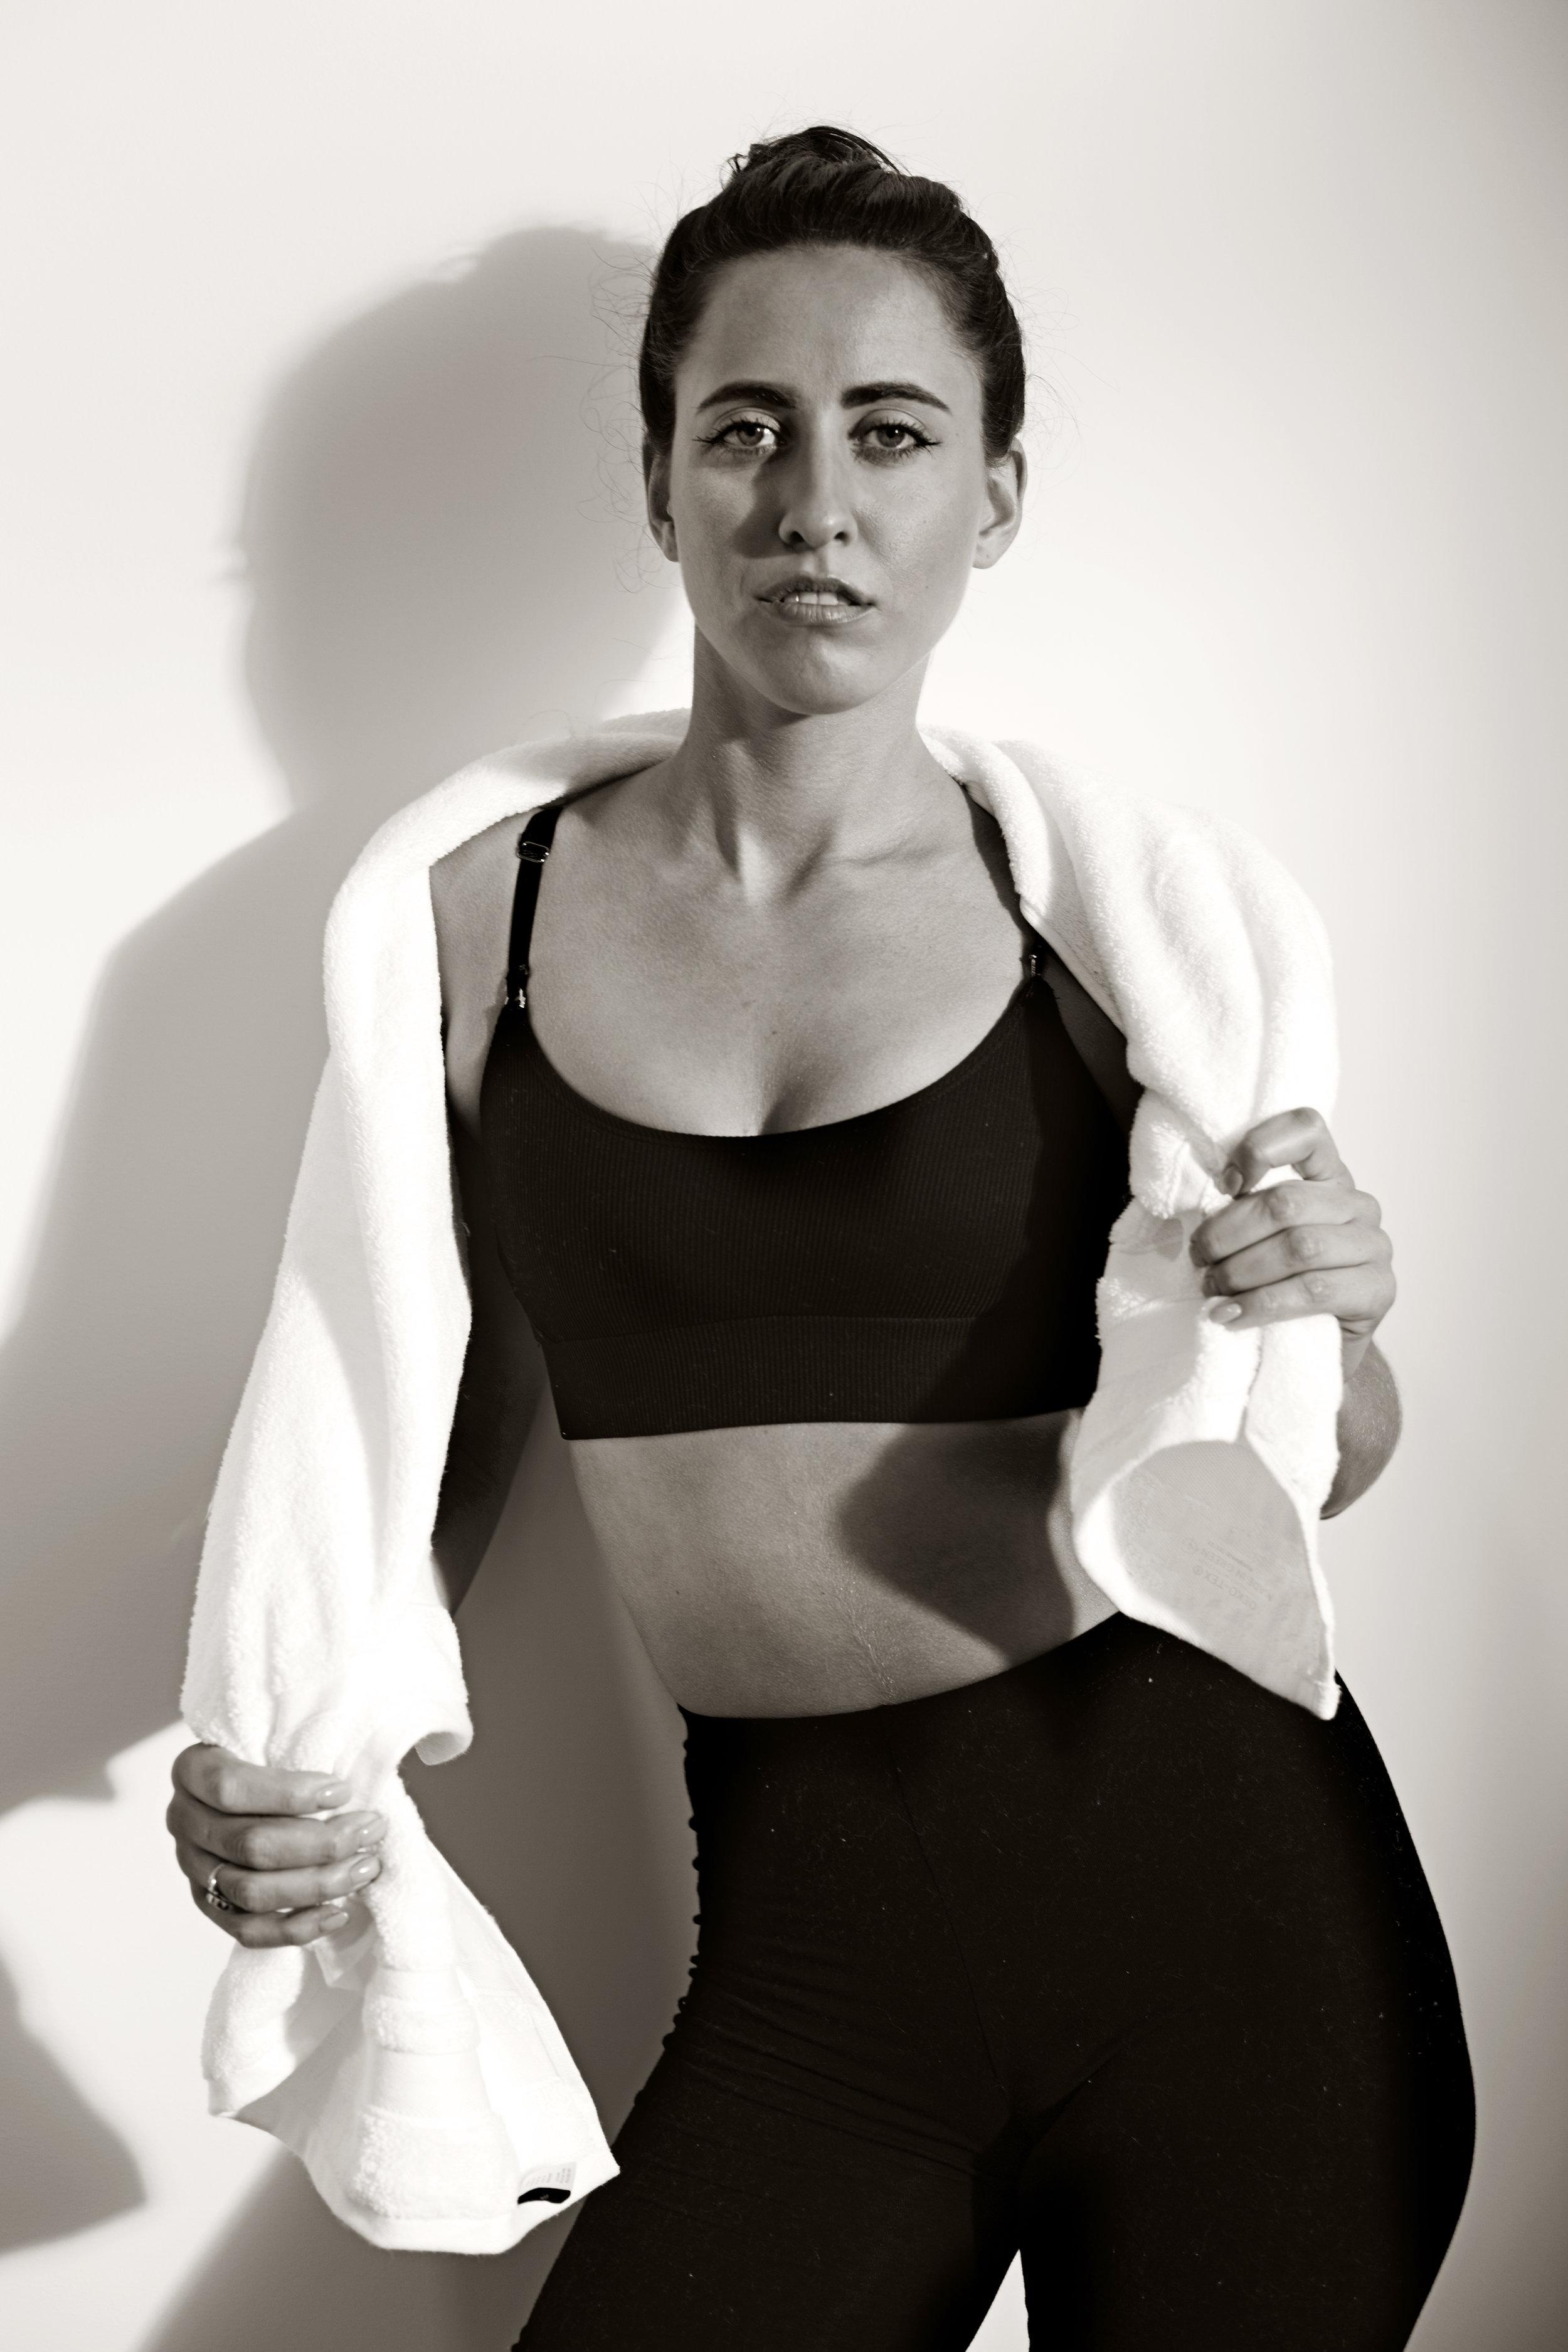 Anna_Towel_Fitness_Editorial_01.jpg